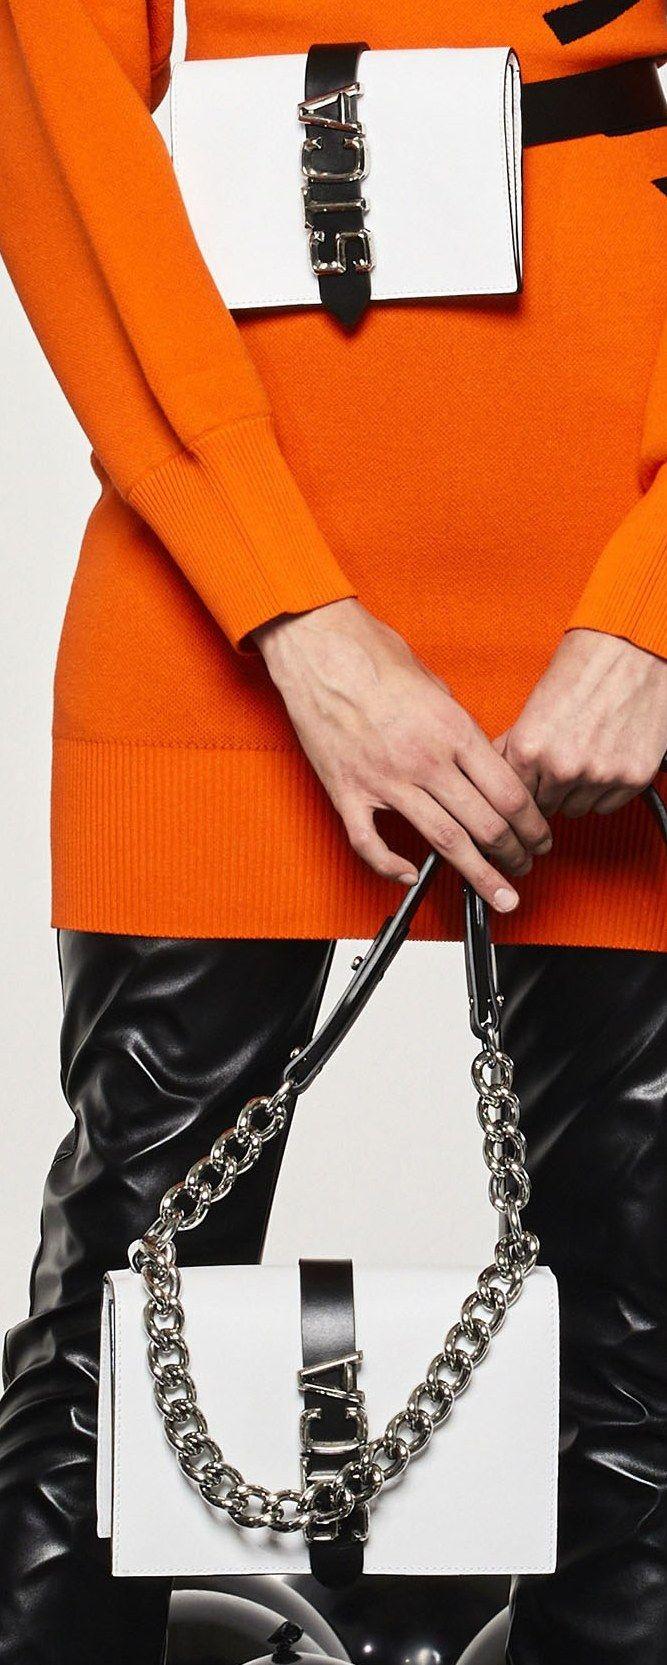 Just Cavalli Pre Fall 2020 Italian Fashion Designers Louis Vuitton Twist Bag Italian Fashion